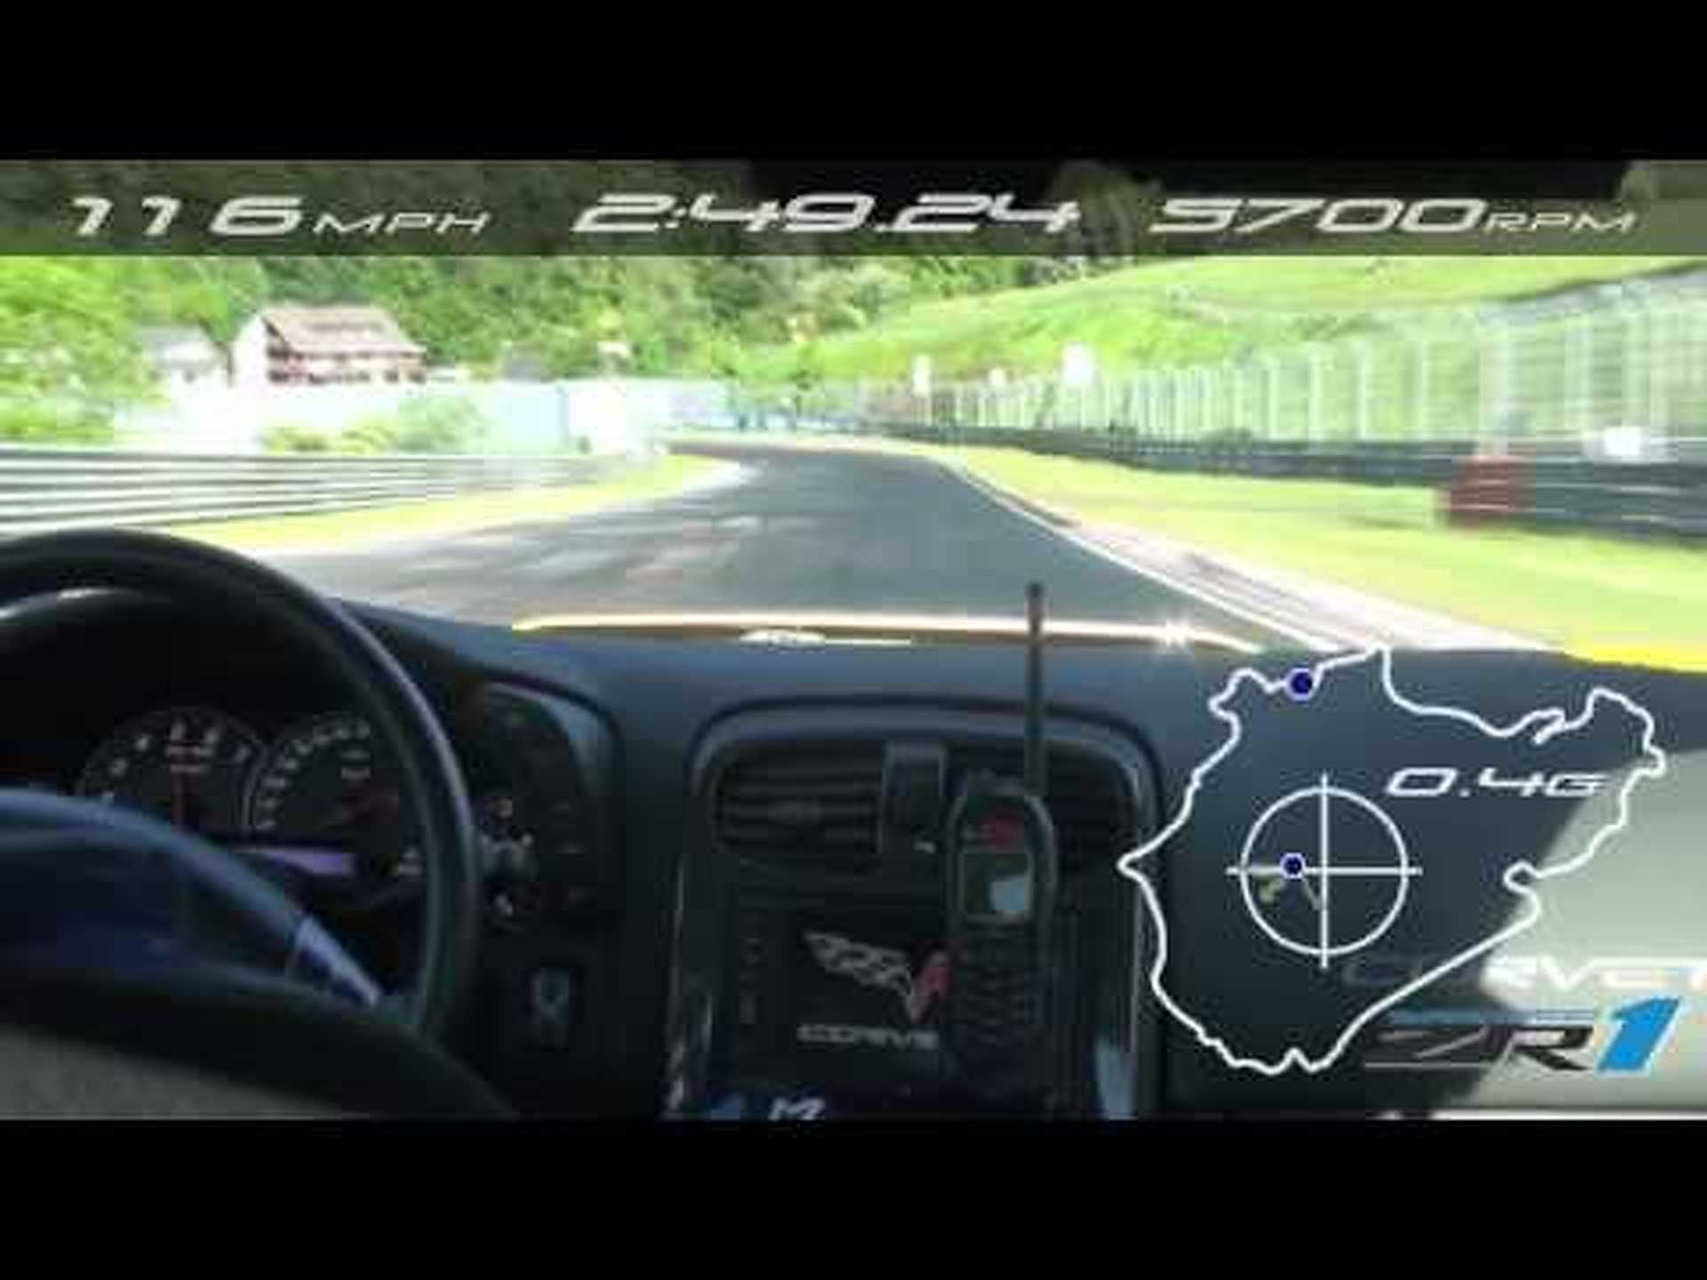 The Chevrolet Corvette ZR1 Takes on Nurburgring